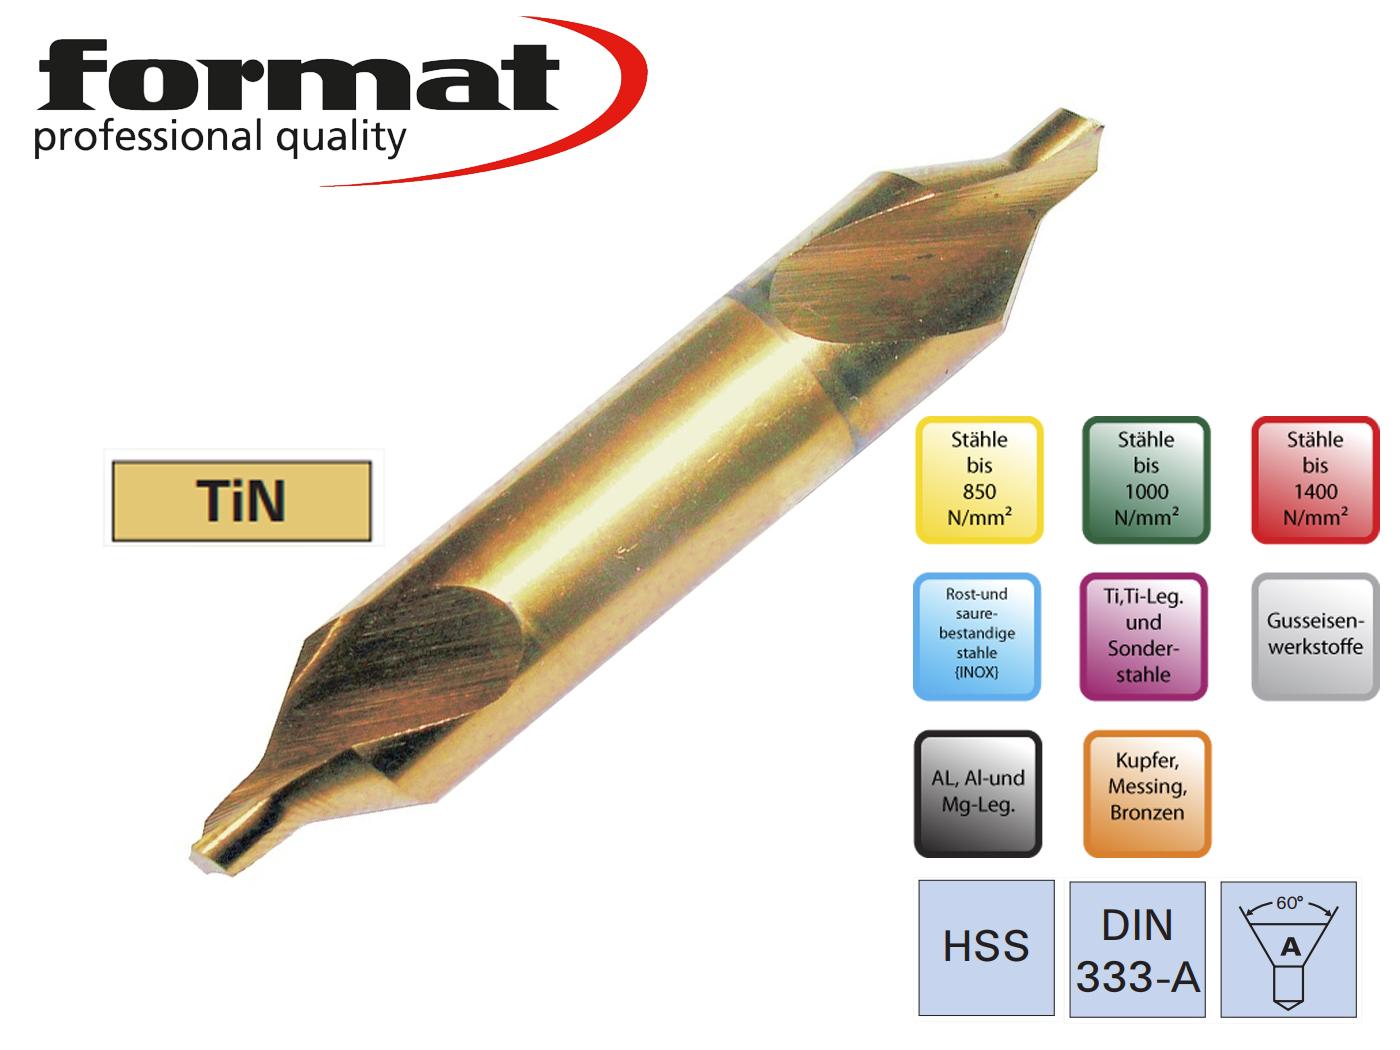 Centreerboren DIN 333 A HSS TiN FORMAT | DKMTools - DKM Tools